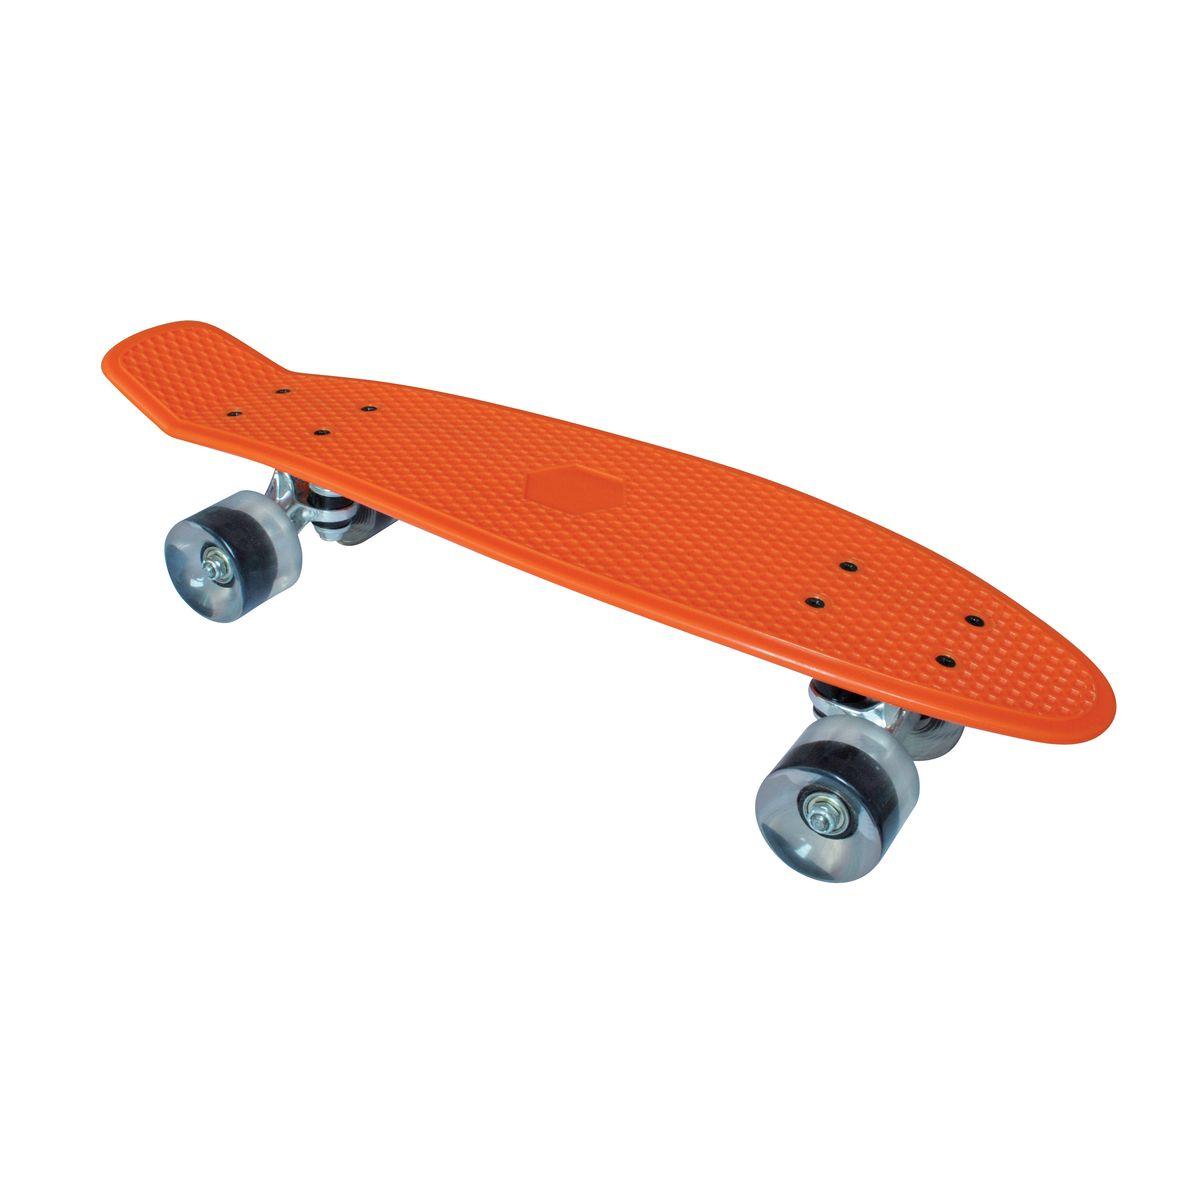 Скейтборд пластиковый Tempish Retro Buffy, цвет: оранжевыйWRA523700Пени борд Tempish Buffy нагрузка до 100 кг